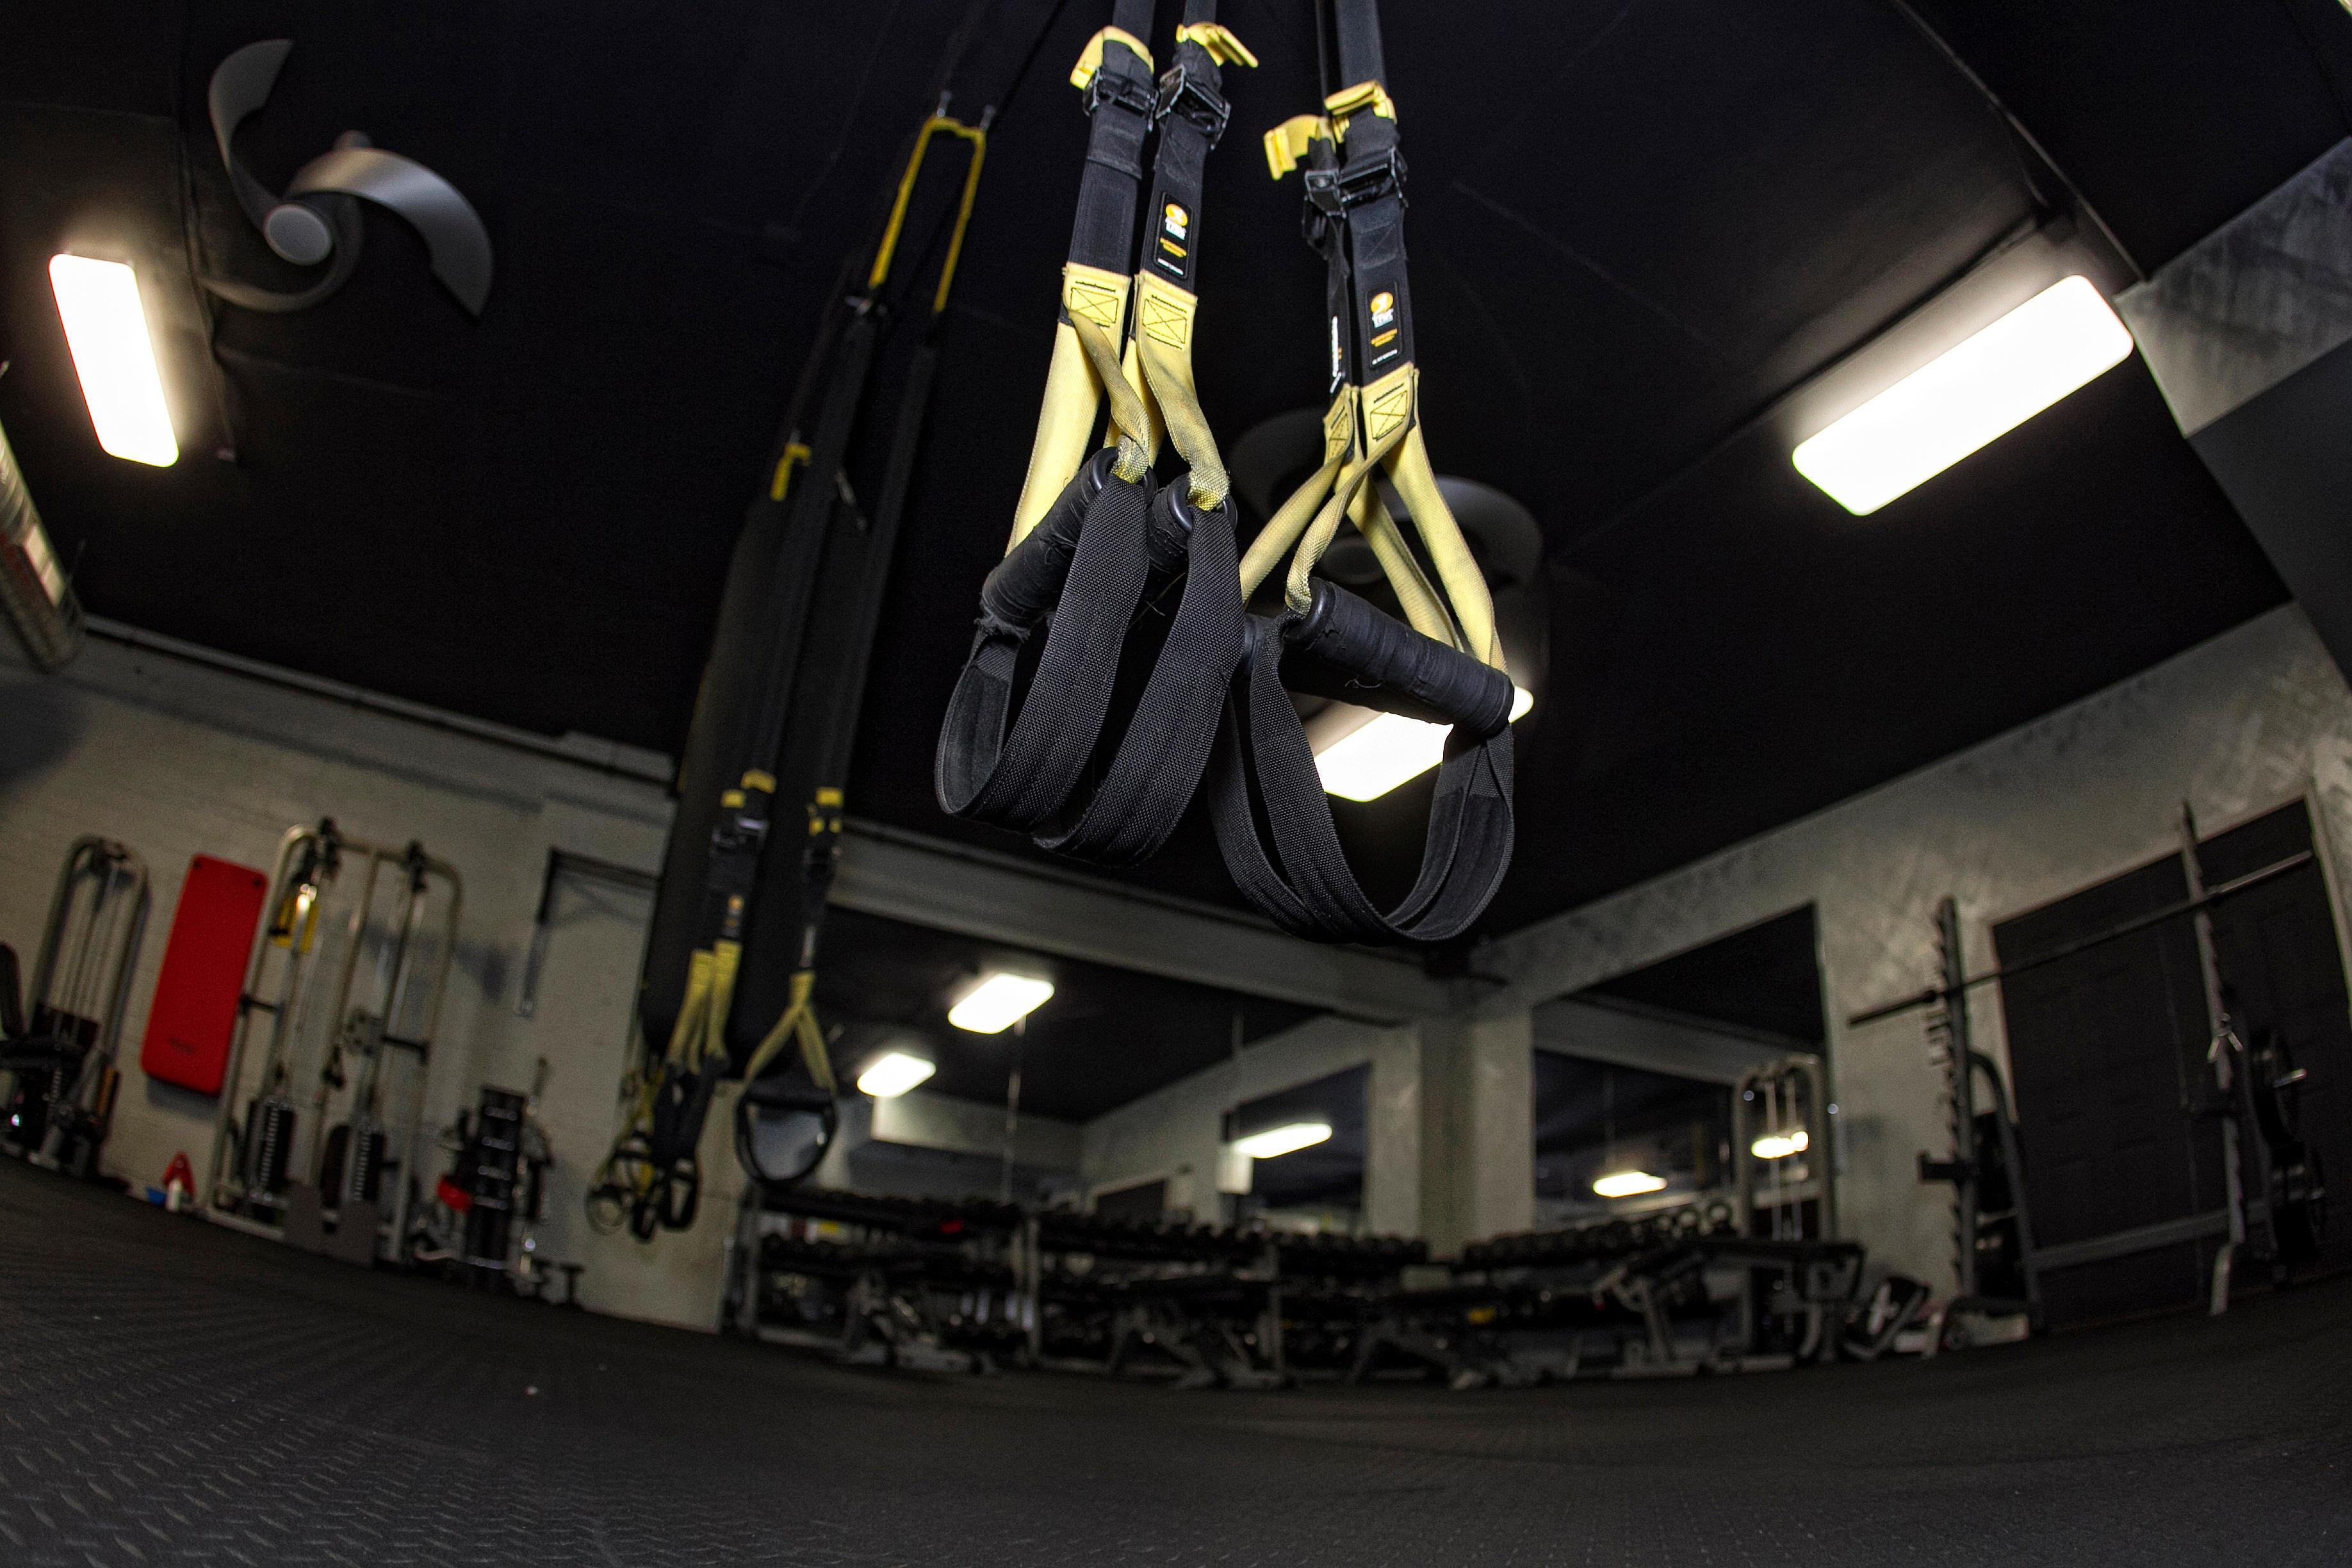 Fierce Fitness LLC image 11